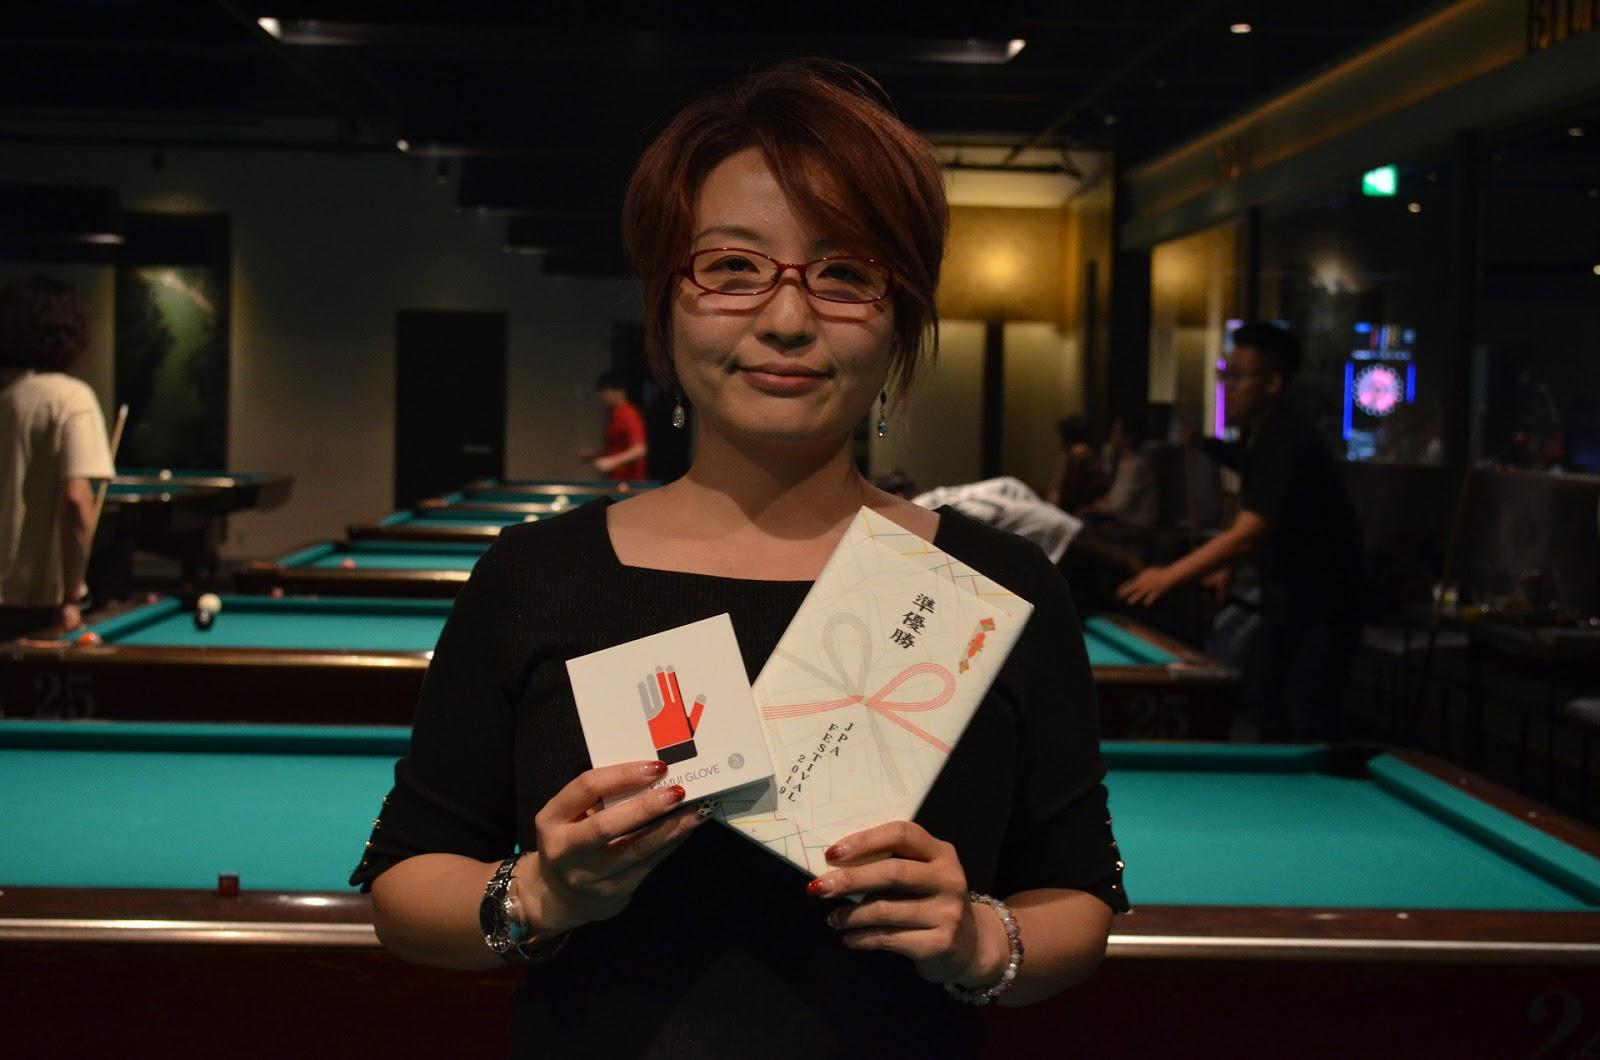 JPA's poolplayers blog